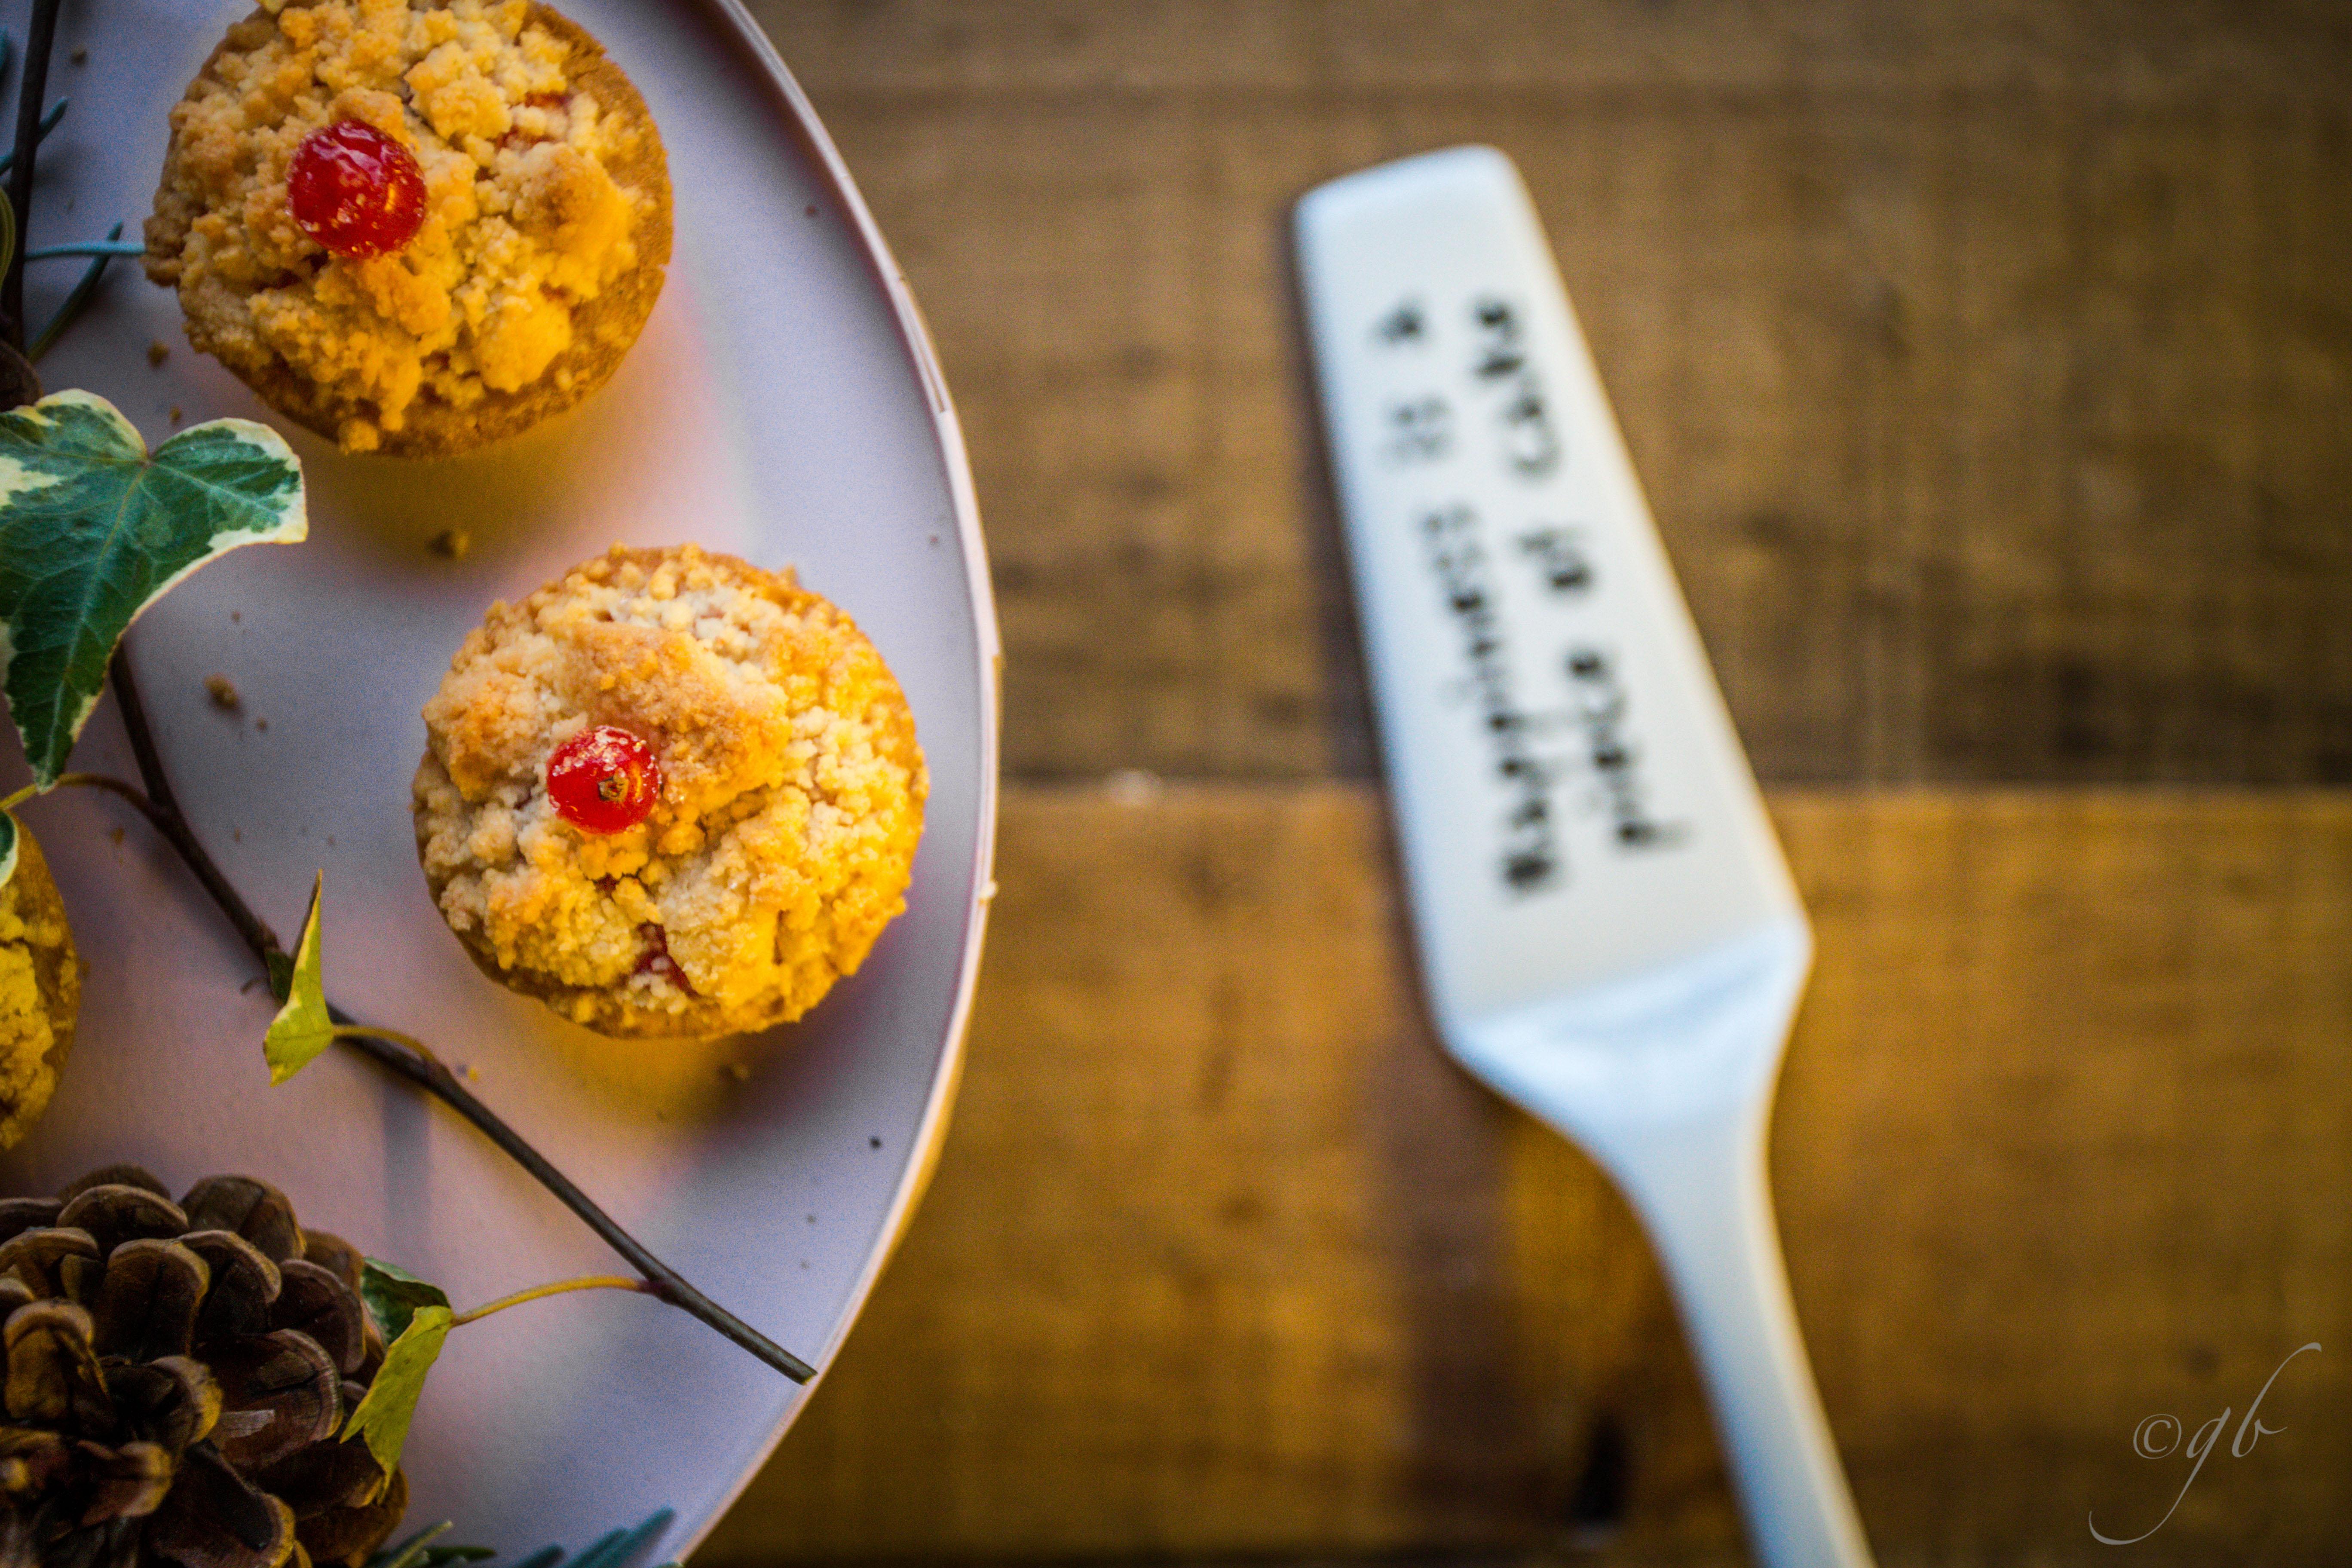 Redcurrants mini-pies